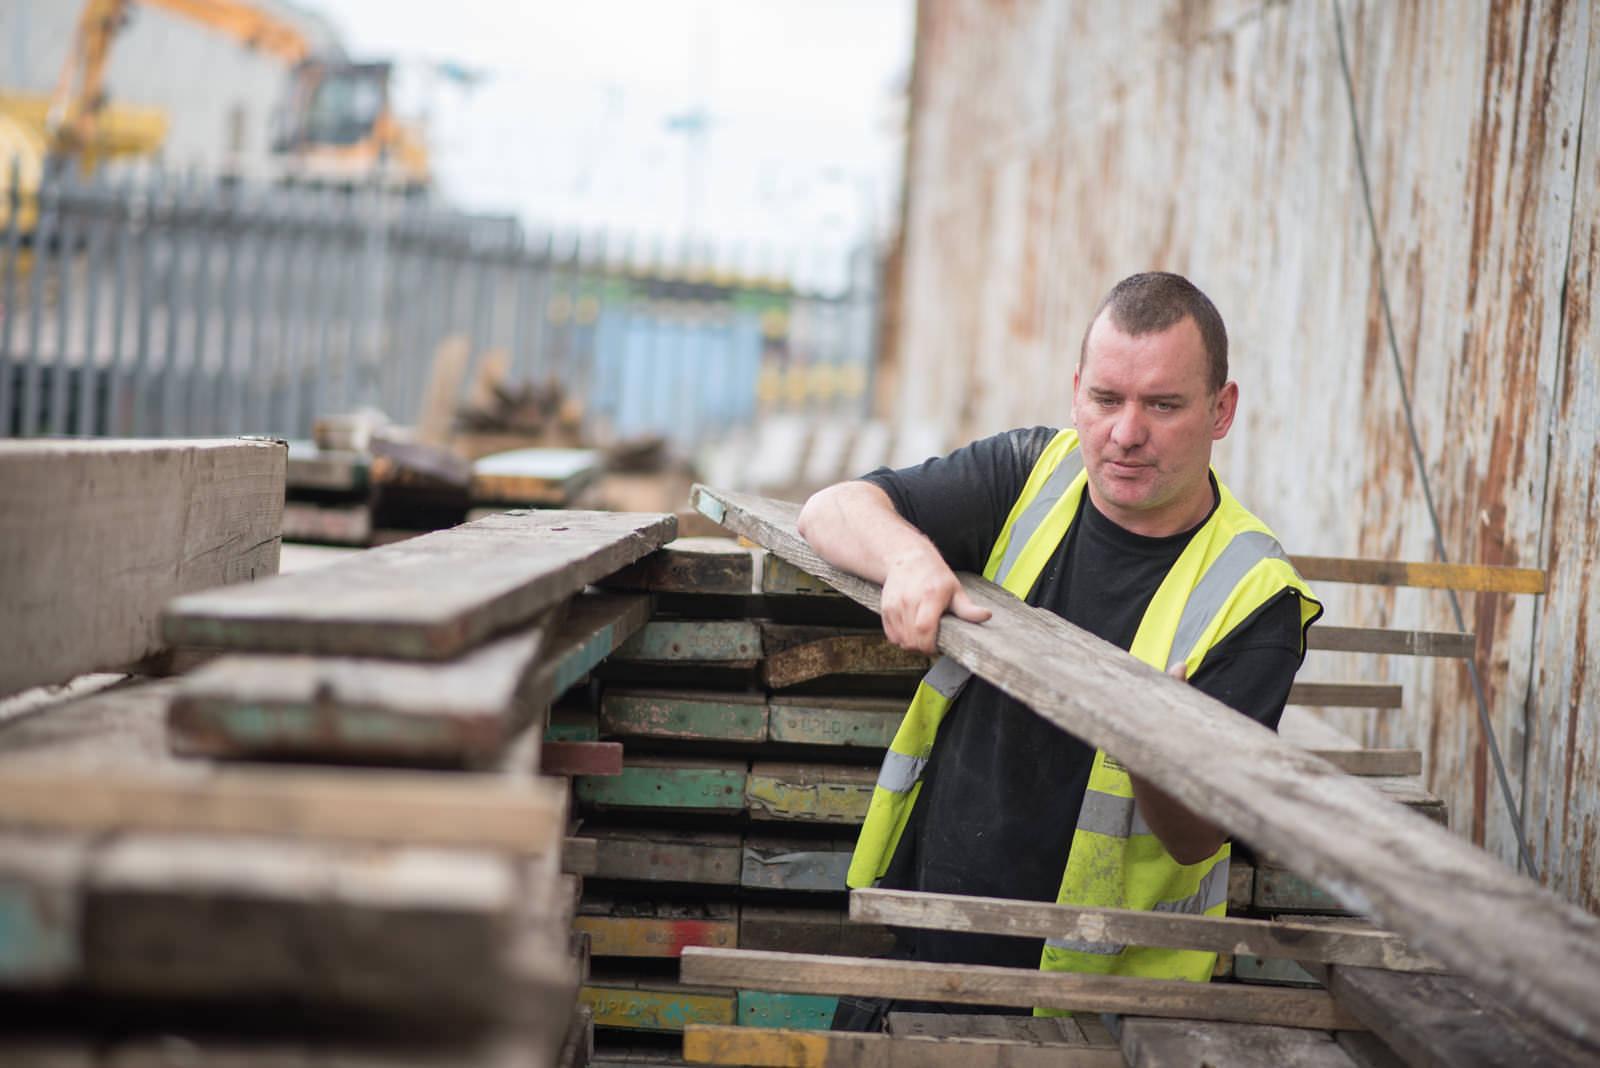 Glasgow Wood Recycling for Glasgow City Marketing Bureau - © Julie Broadfoot - www.juliebee.co.uk